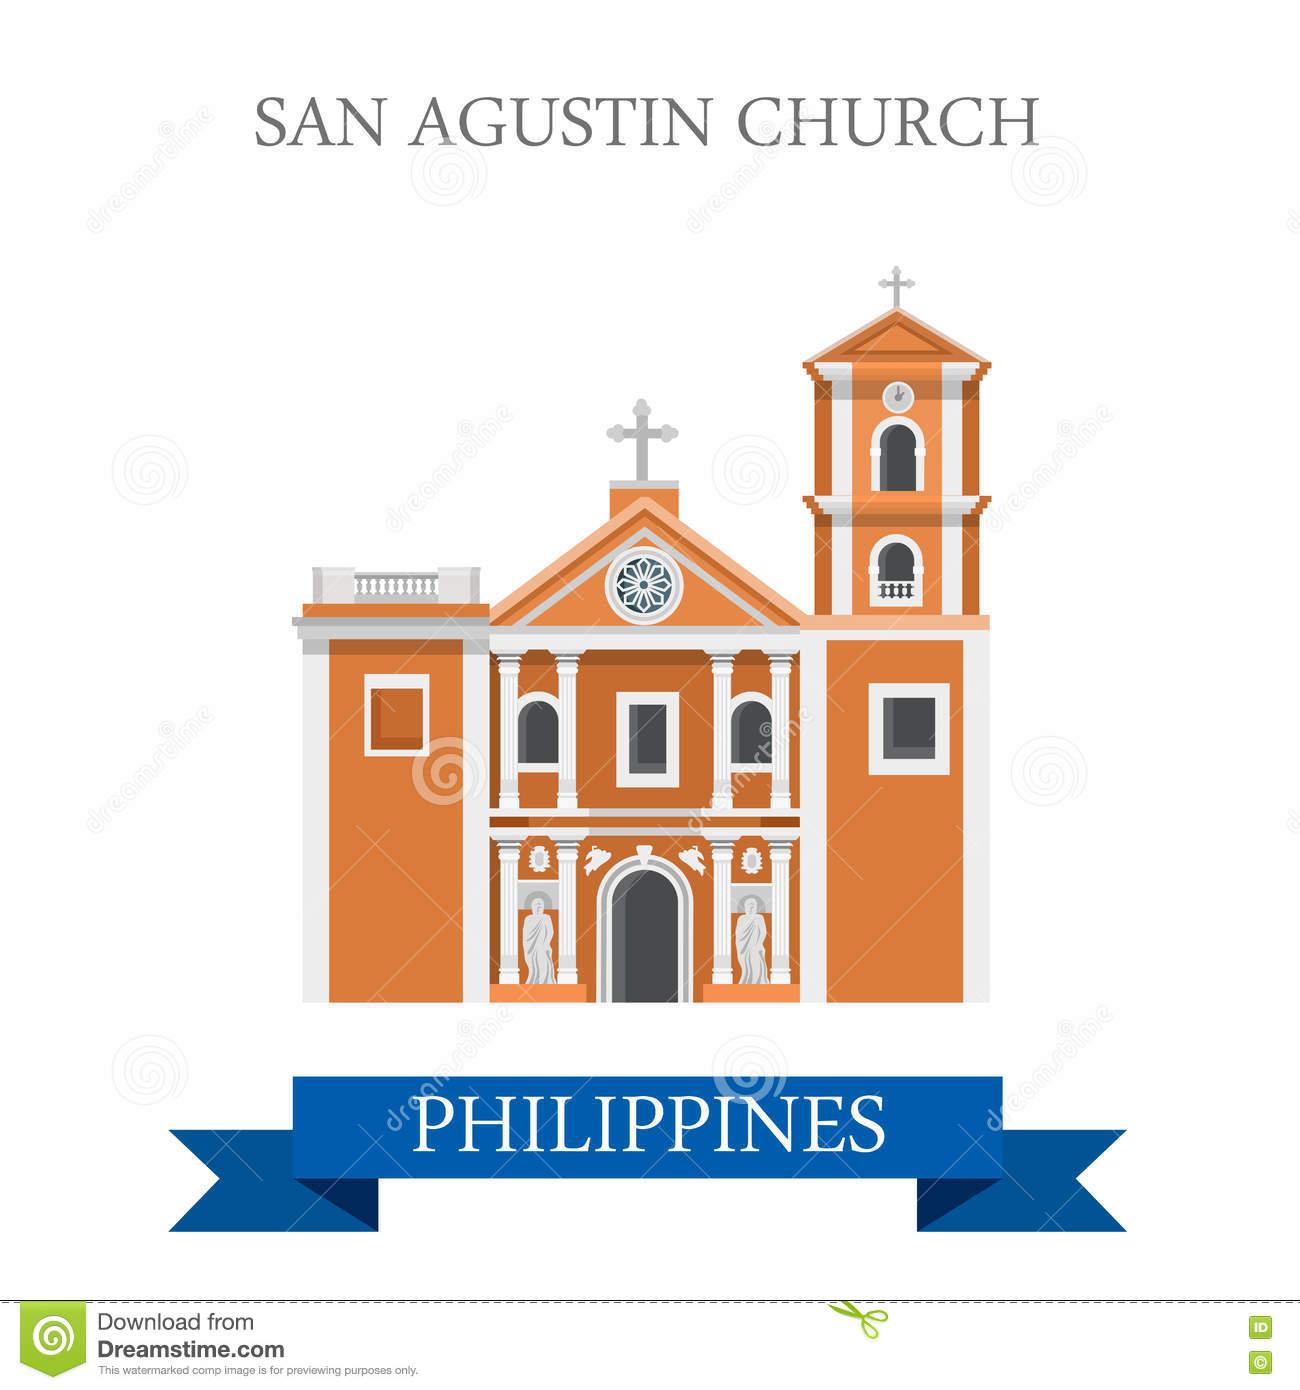 San Agustin Church Manila Philippines Vector Flat Attraction Stock.